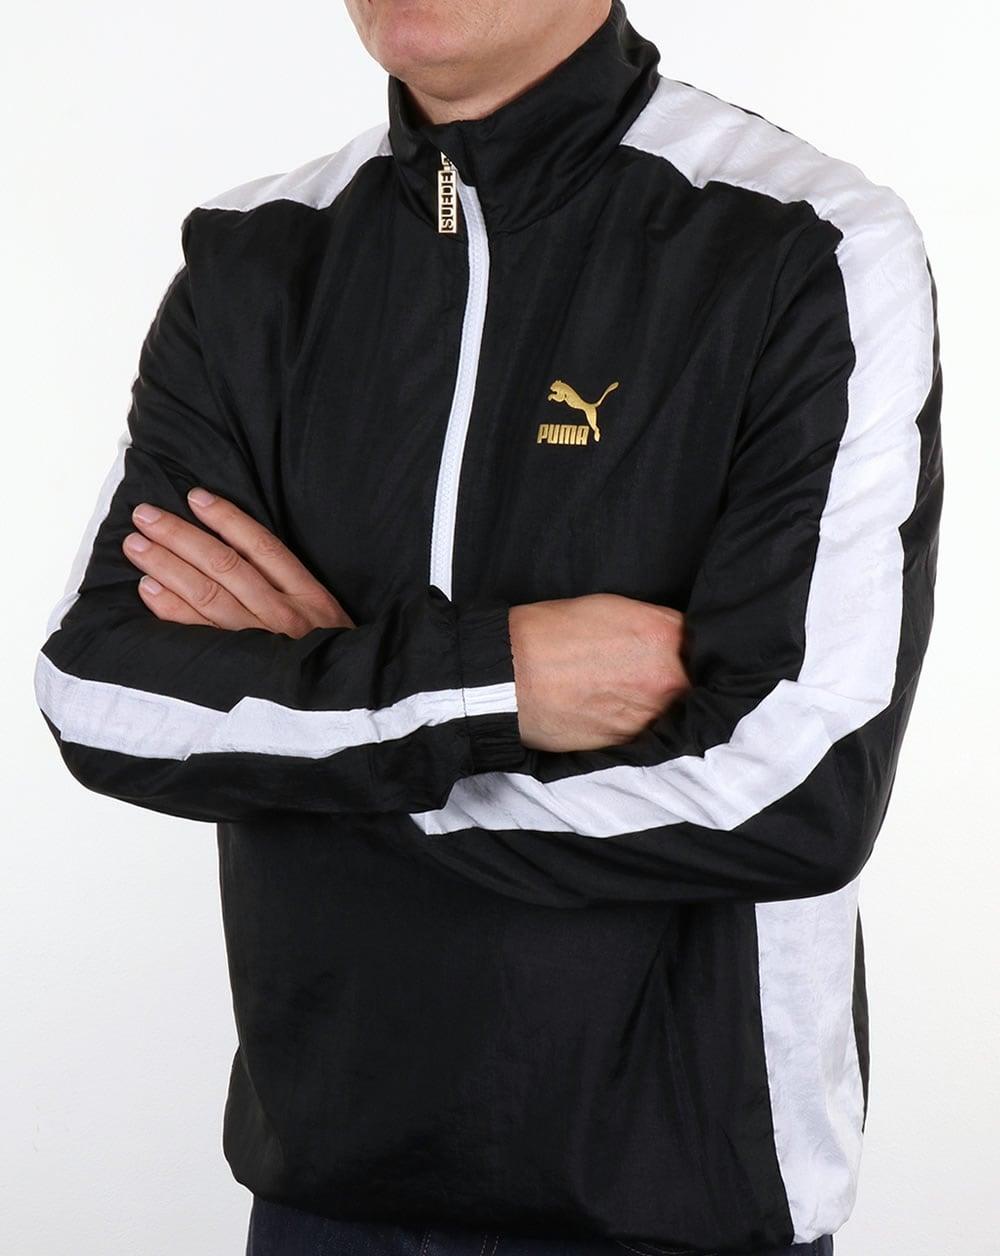 2f6a67a87b48 Puma Savannah Bboy Jacket Black white